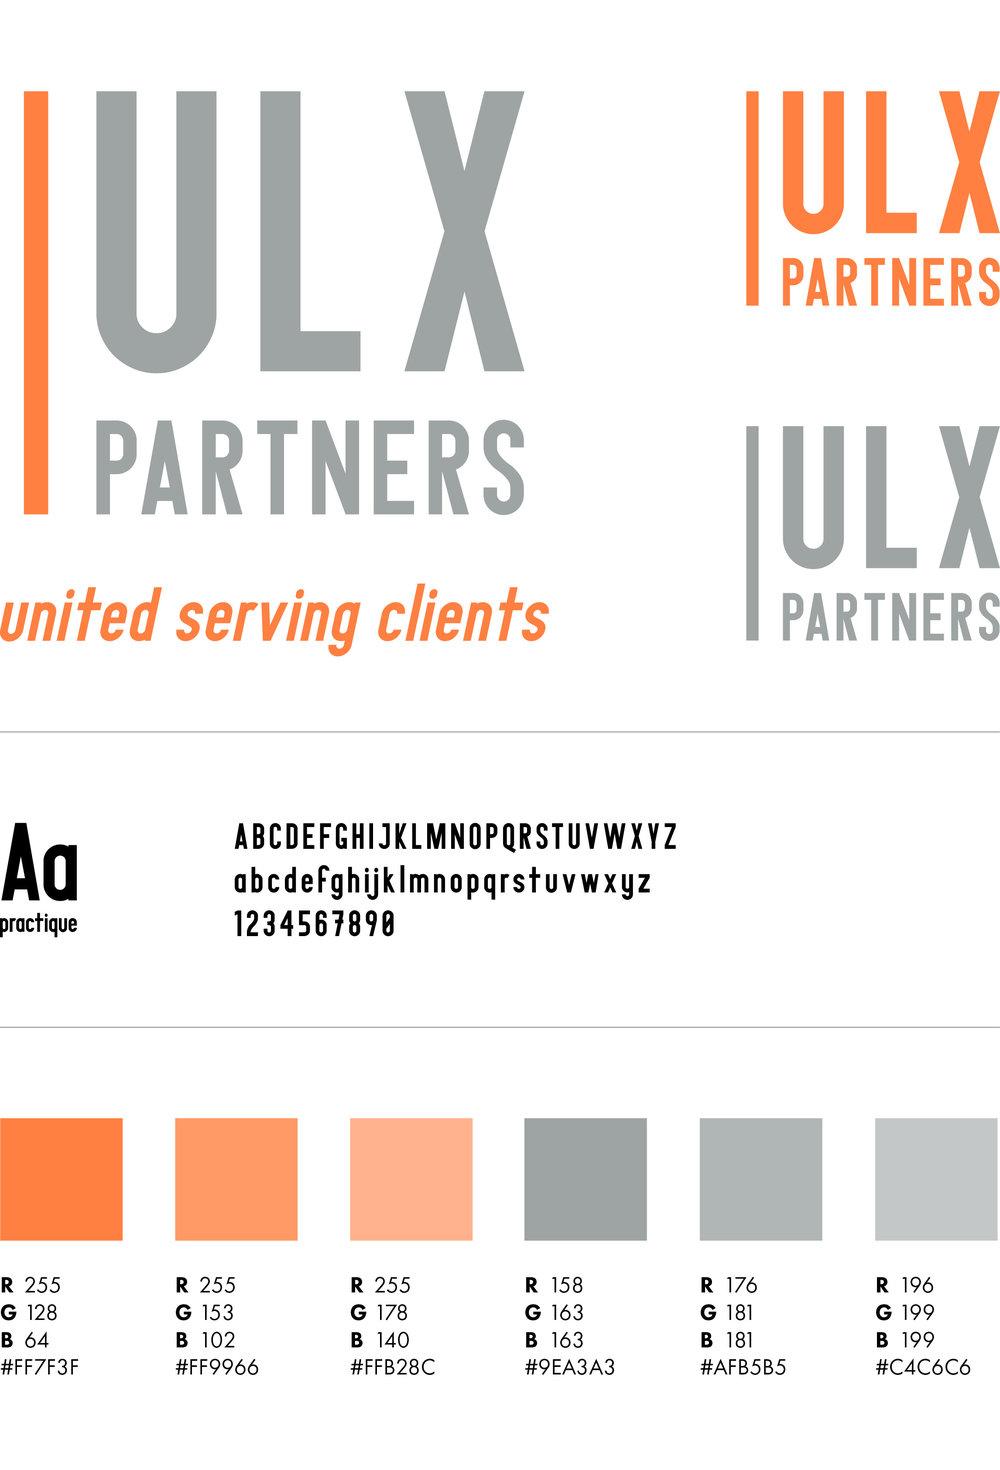 ulx partners